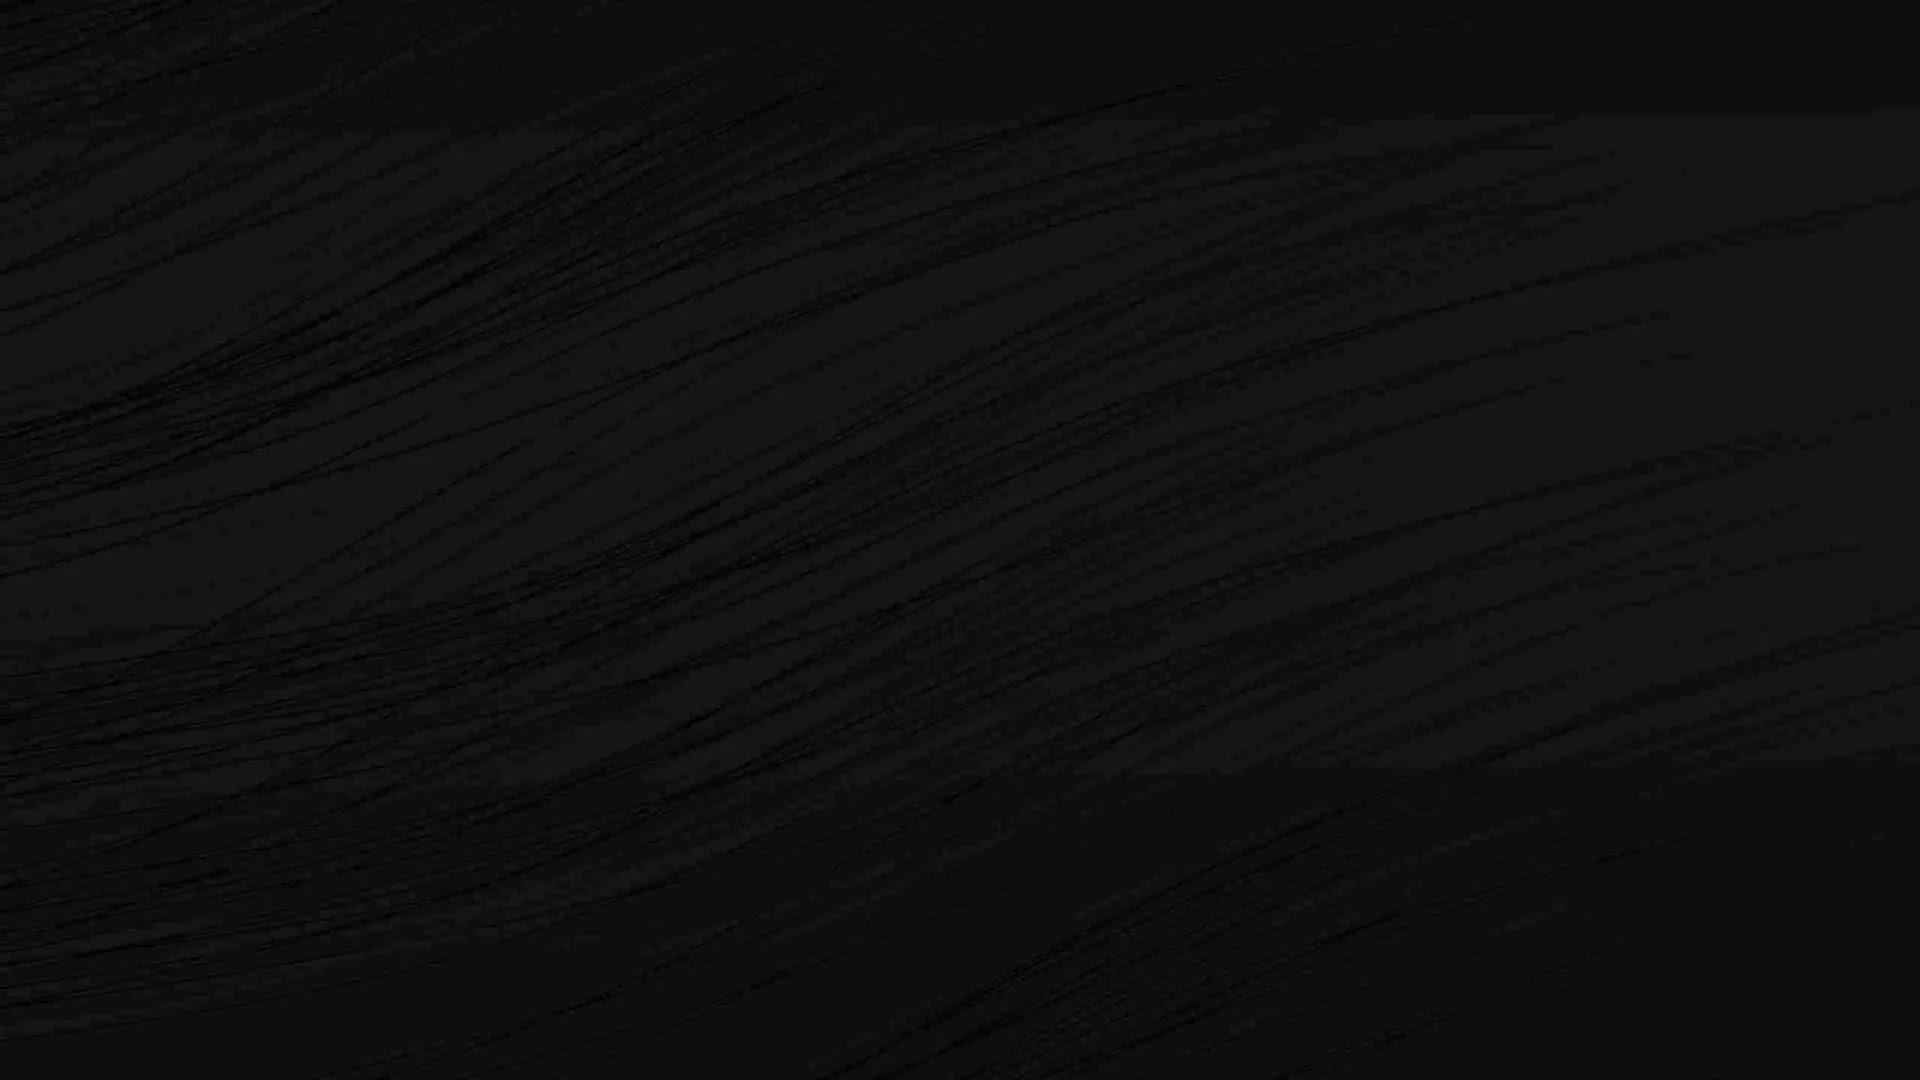 full hd black wallpaper